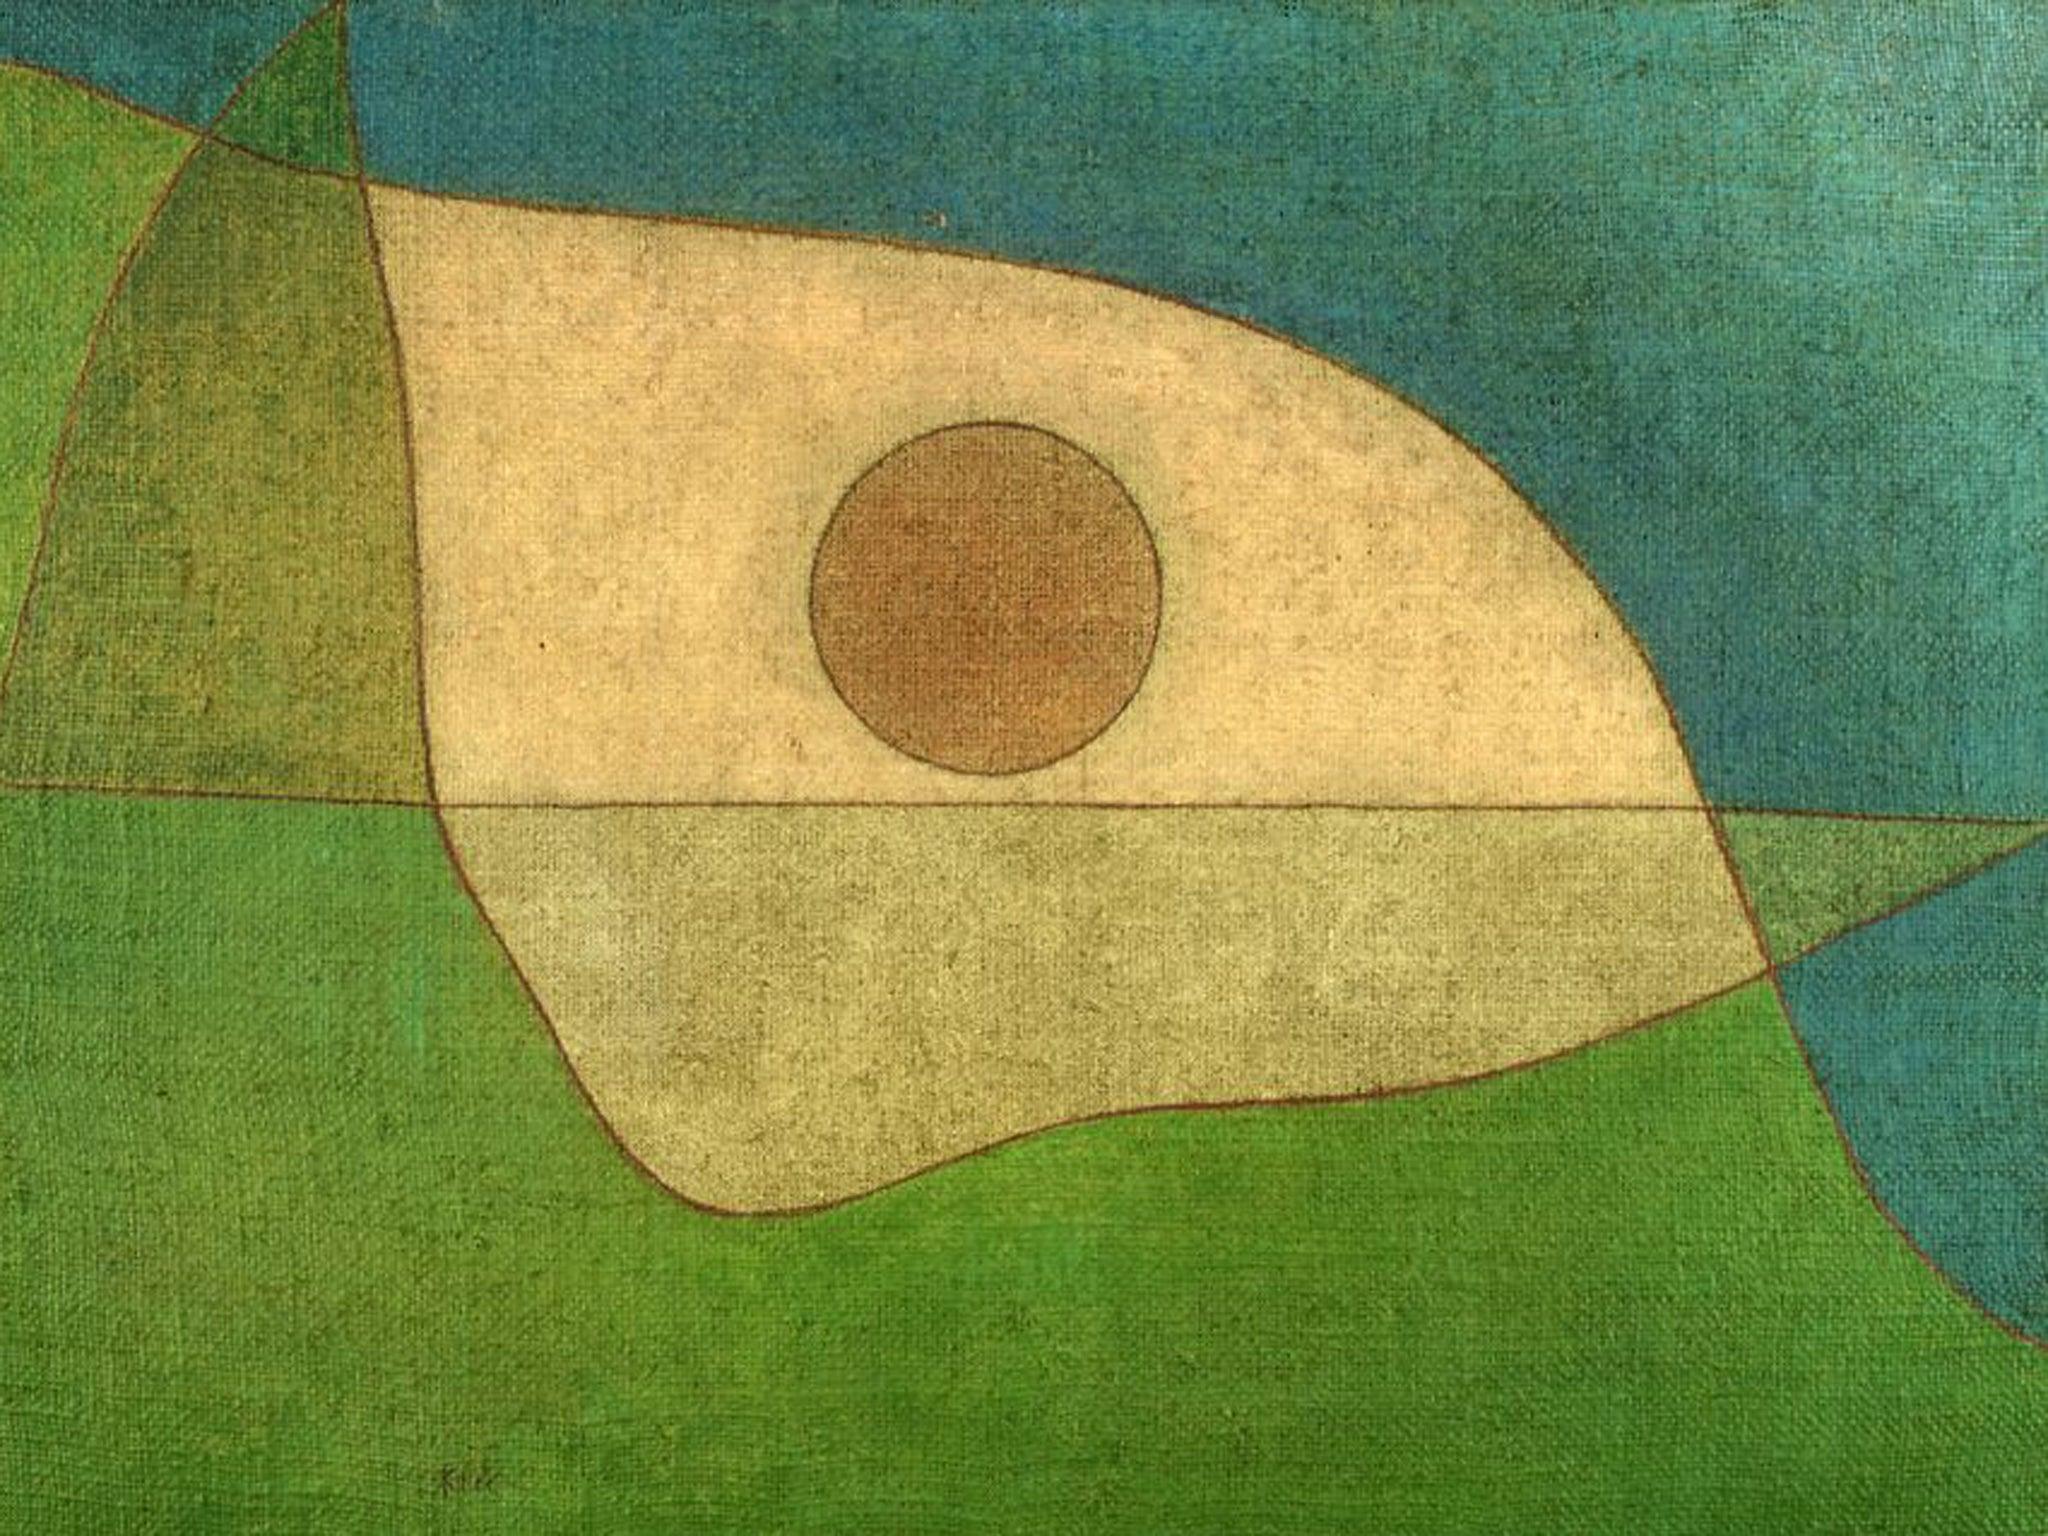 c36a5de7188 Paul Klee  Triumph of a  degenerate